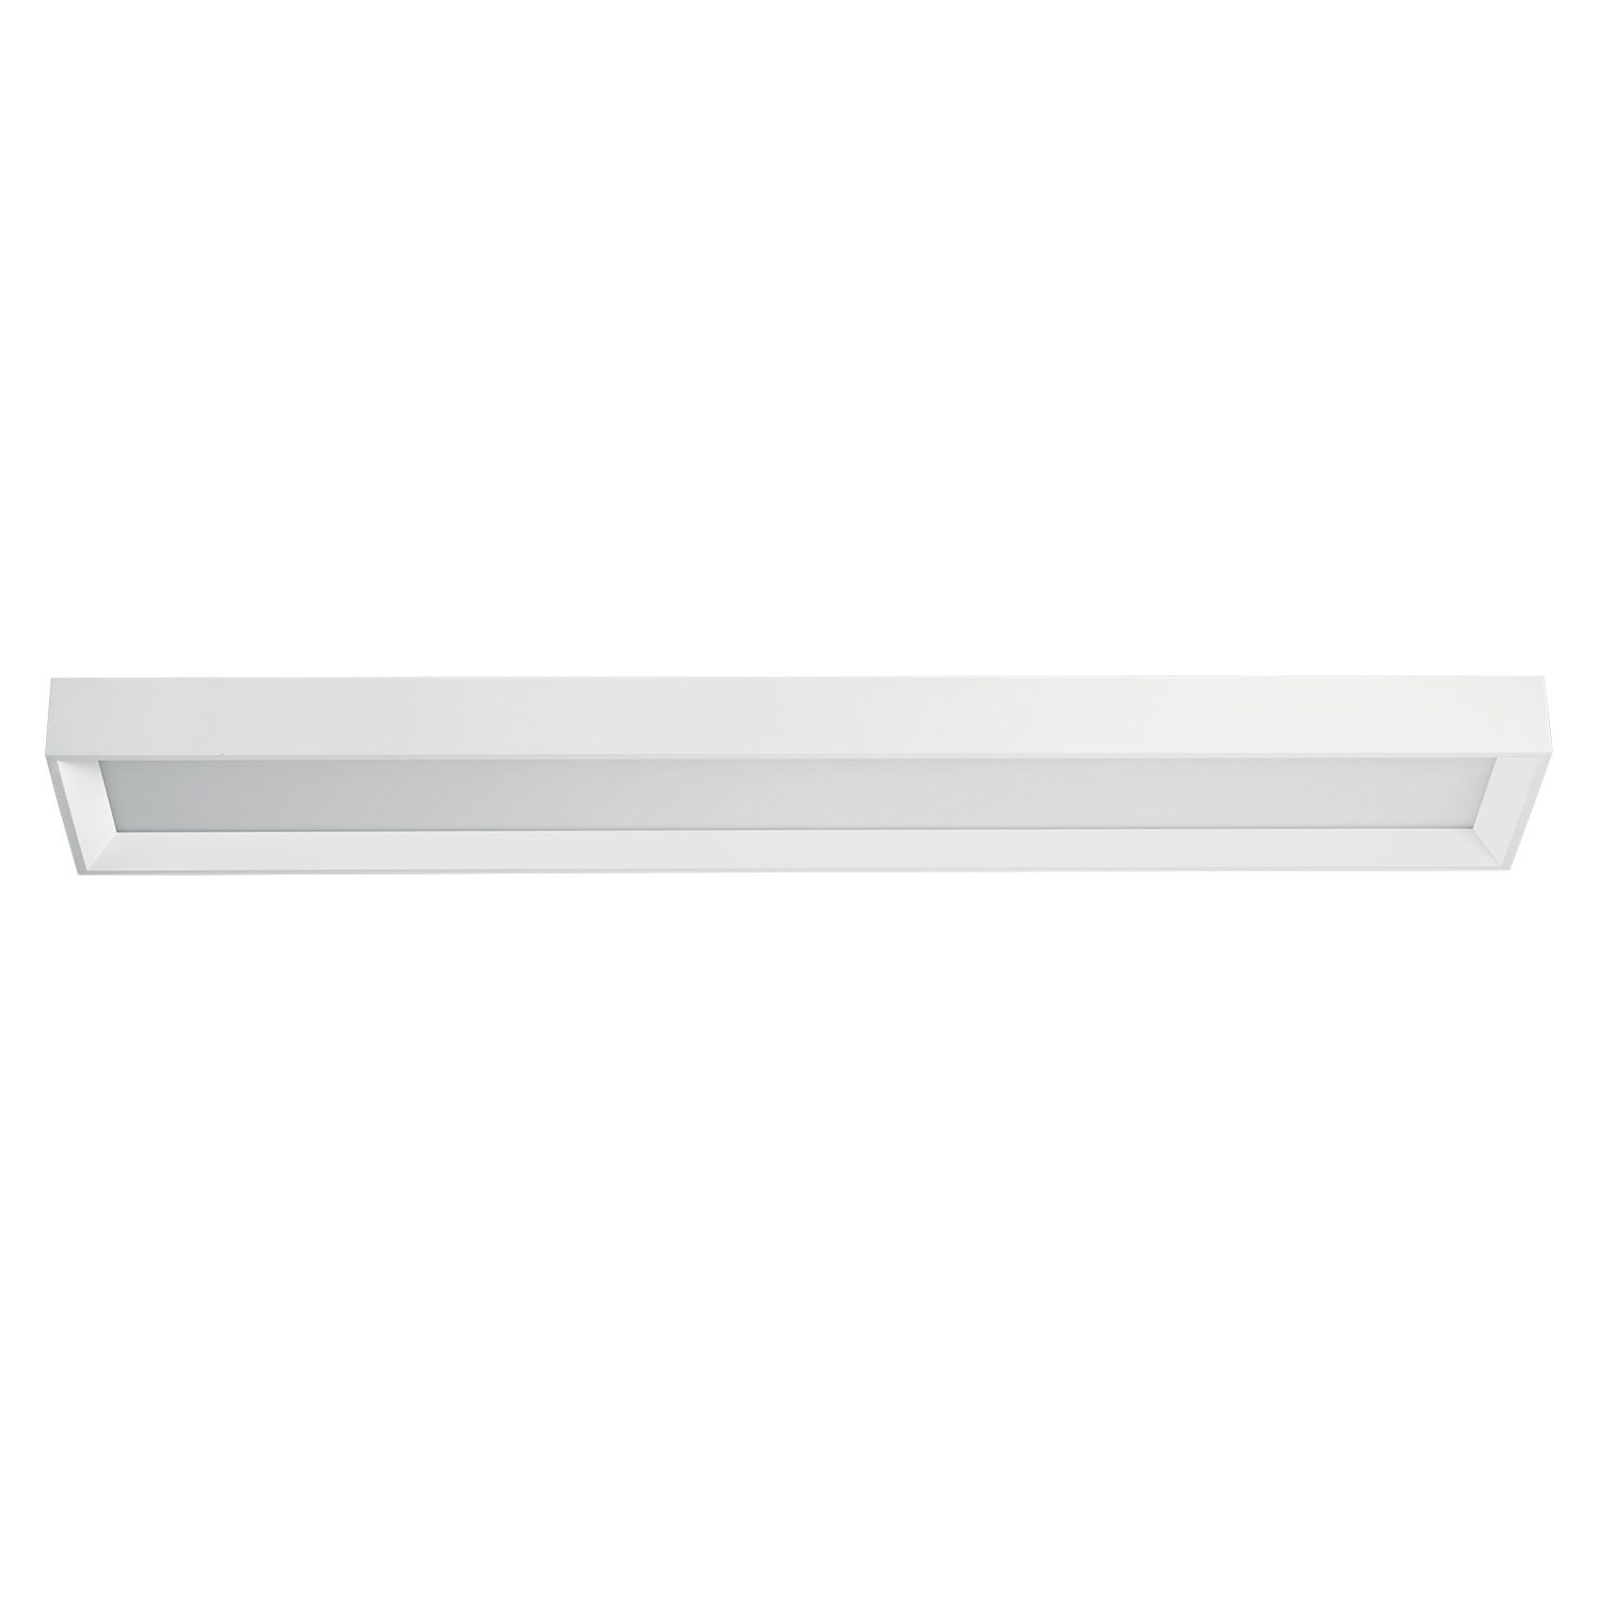 LED-Deckenleuchte Tara dimmable, 109 x 19 cm